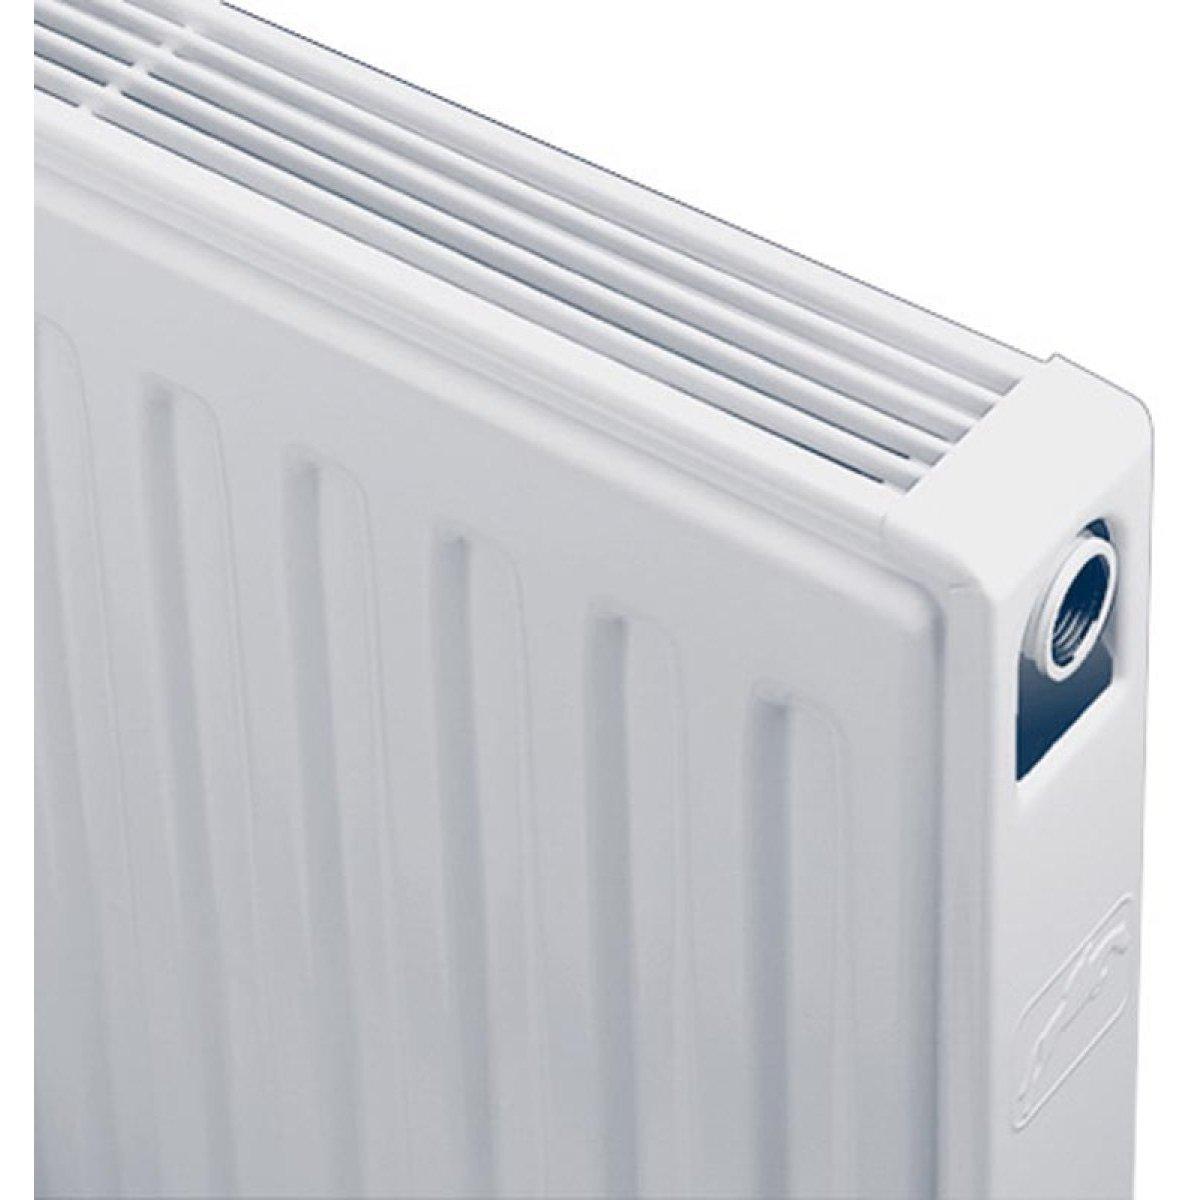 radiateur compact 4 connexions type 22 h700mm 36 lements. Black Bedroom Furniture Sets. Home Design Ideas